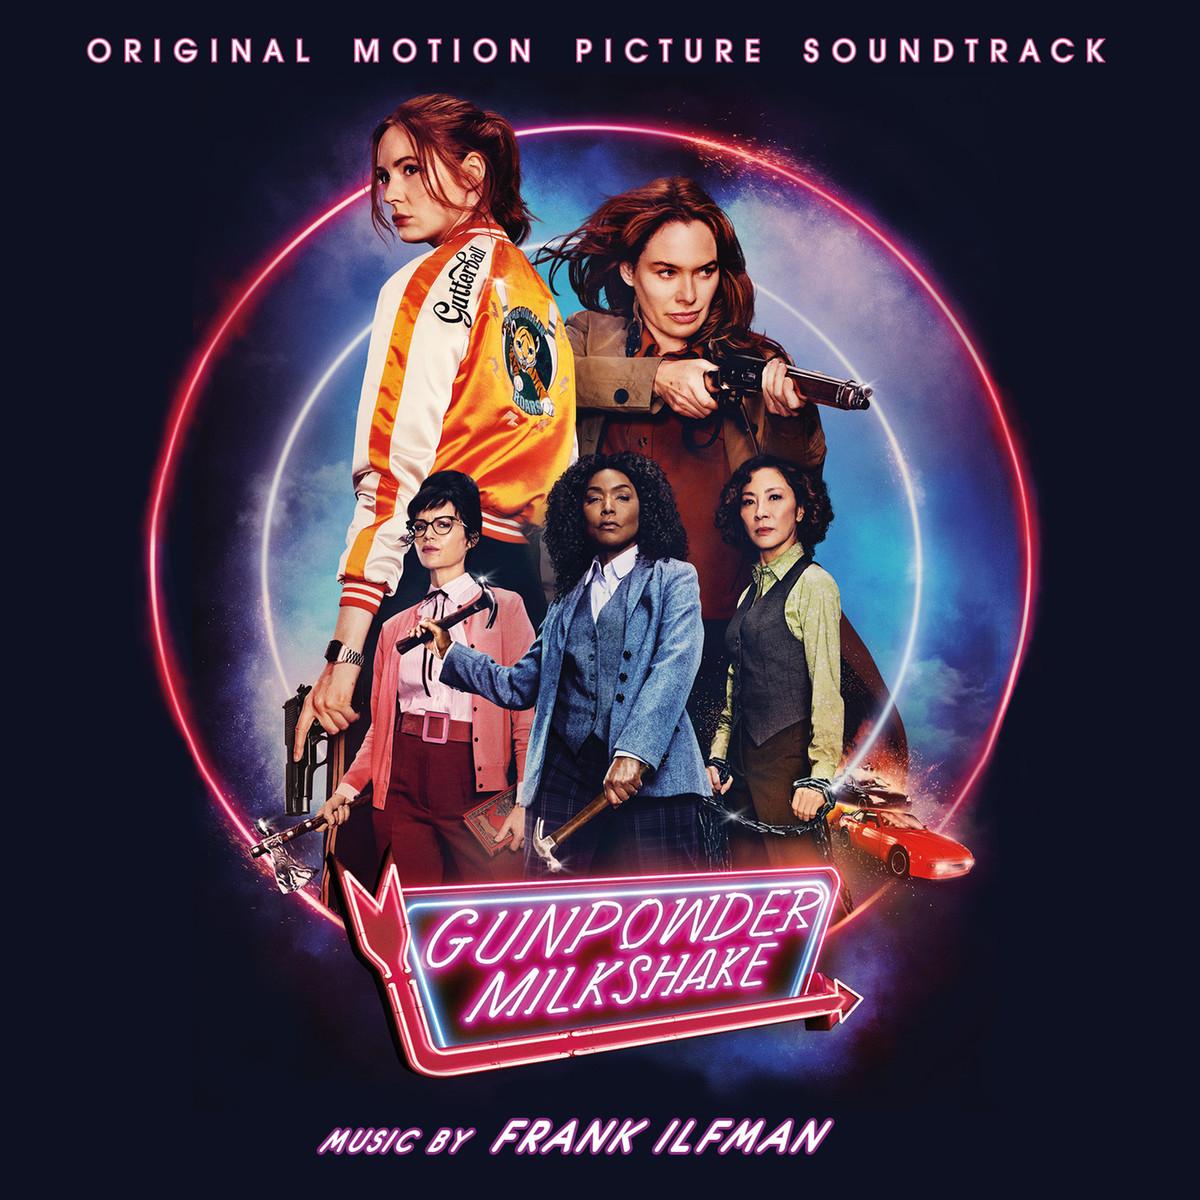 Gunpowder Milkshake Original Motion Picture Soundtrack Songs Download Gunpowder Milkshake Original Motion Picture Soundtrack Mp3 Songs Online Free On Gaana Com